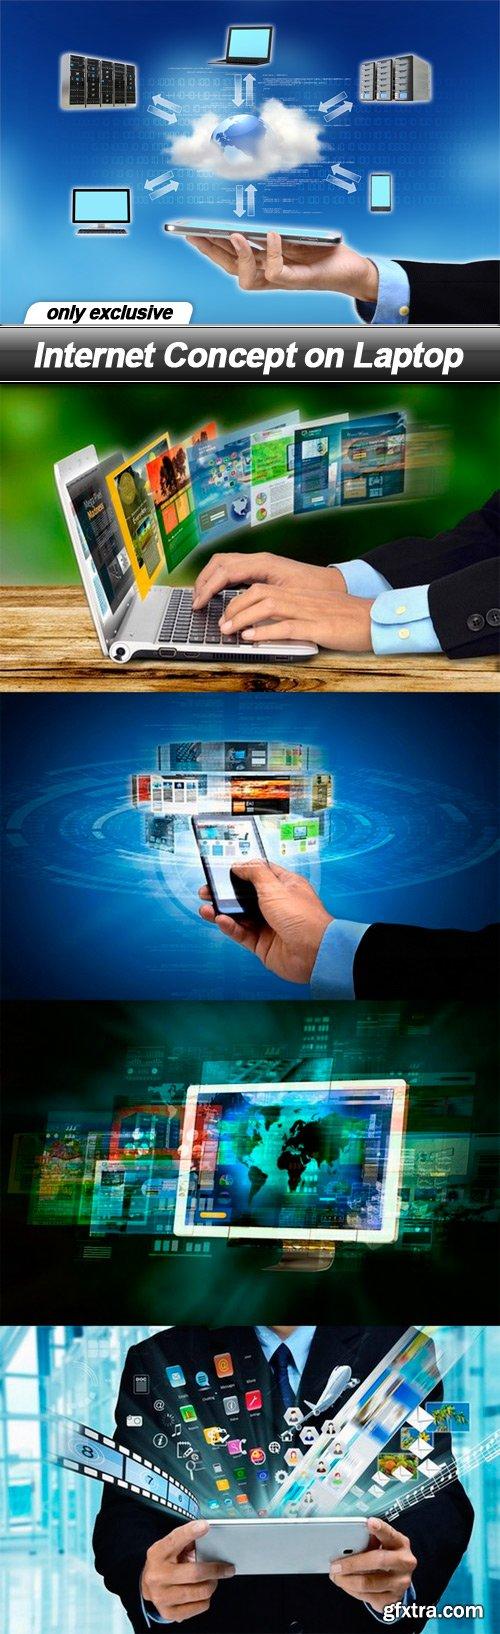 Internet Concept on Laptop - 5 UHQ JPEG